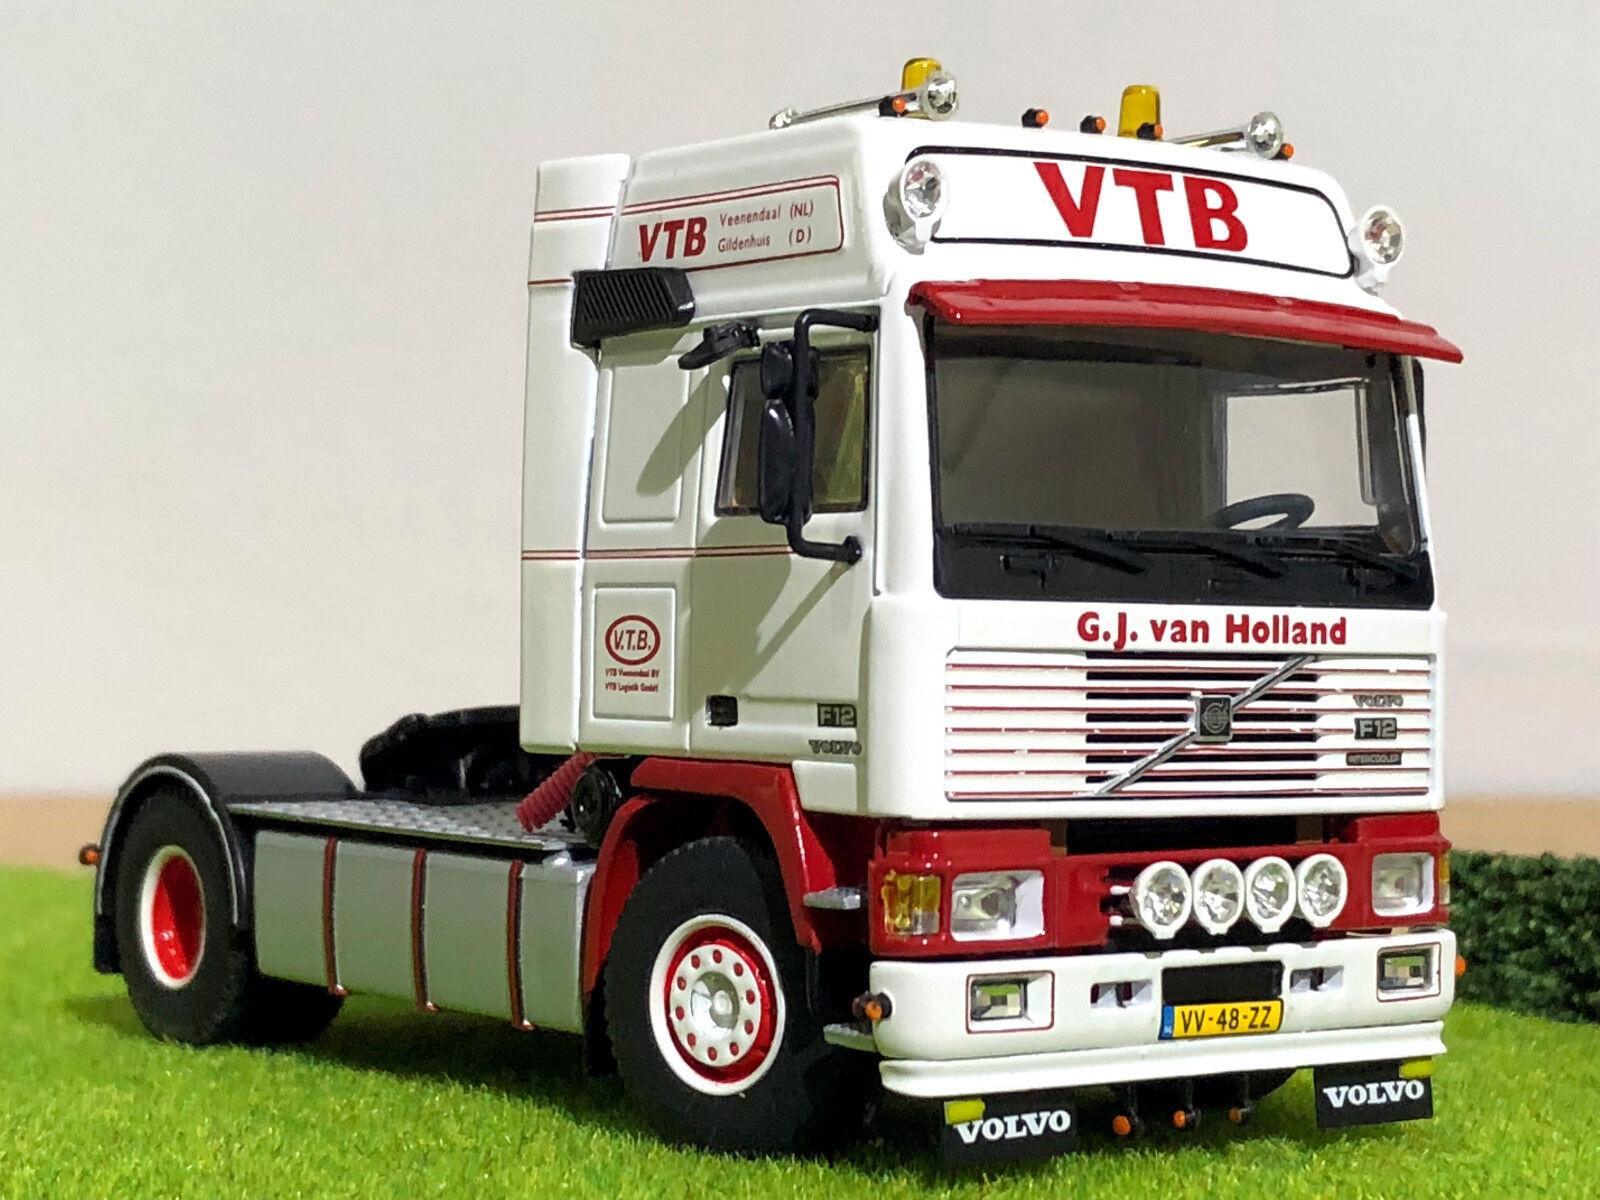 WSI TRUCK MODELS,VOLVO F12 TURBO INTERCOOLER 4x2  SINGLE TRUCK, VTB  1 50